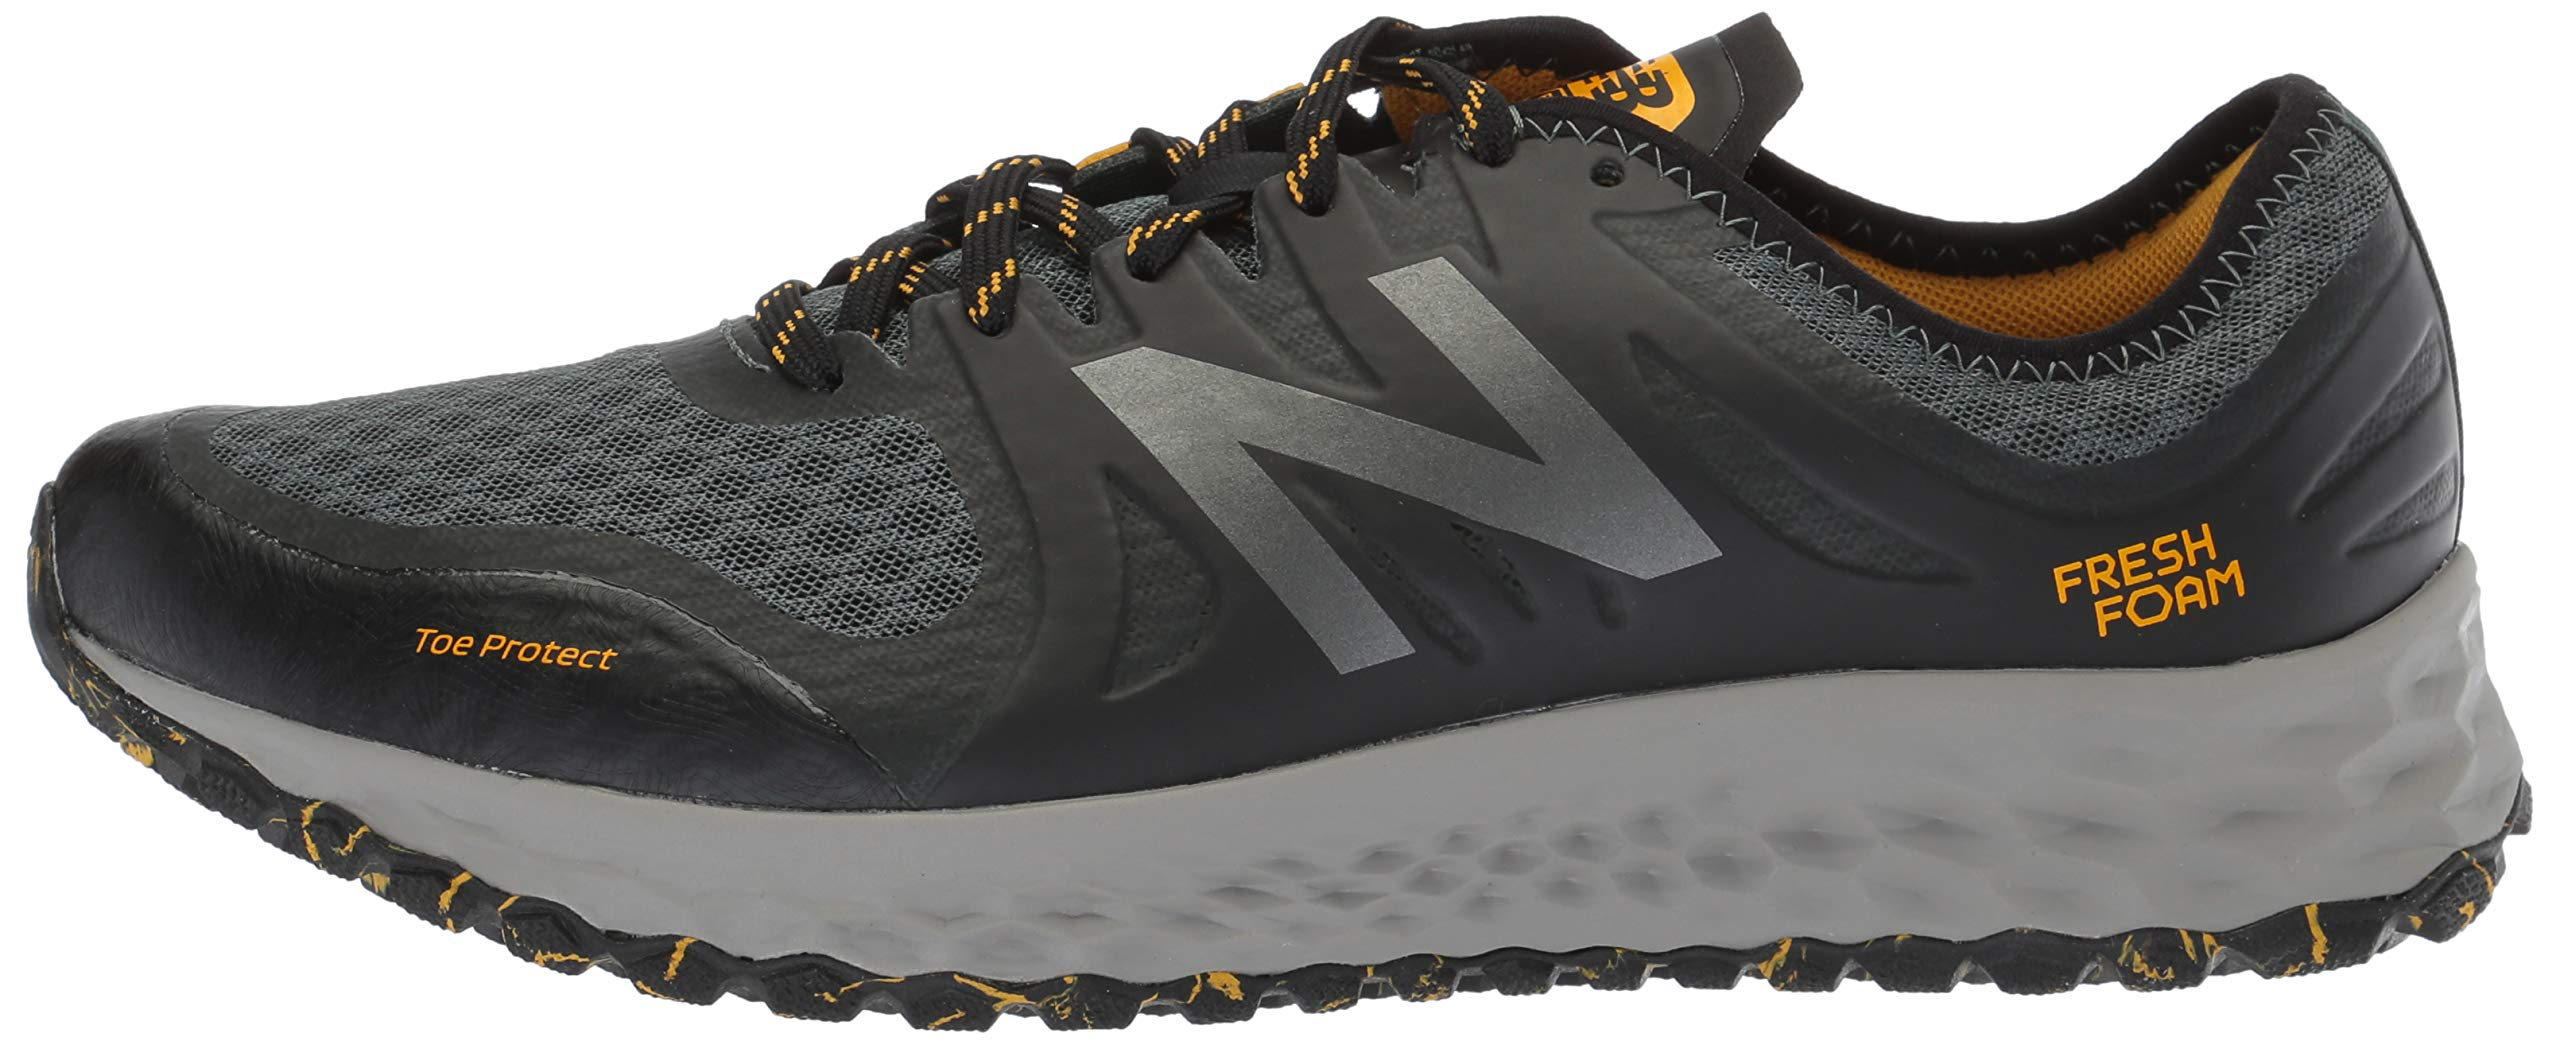 New Balance Men's Kaymin V1 Fresh Foam Trail Running Shoe, Faded Rosin/Black/Brass, 1.5 D US by New Balance (Image #5)